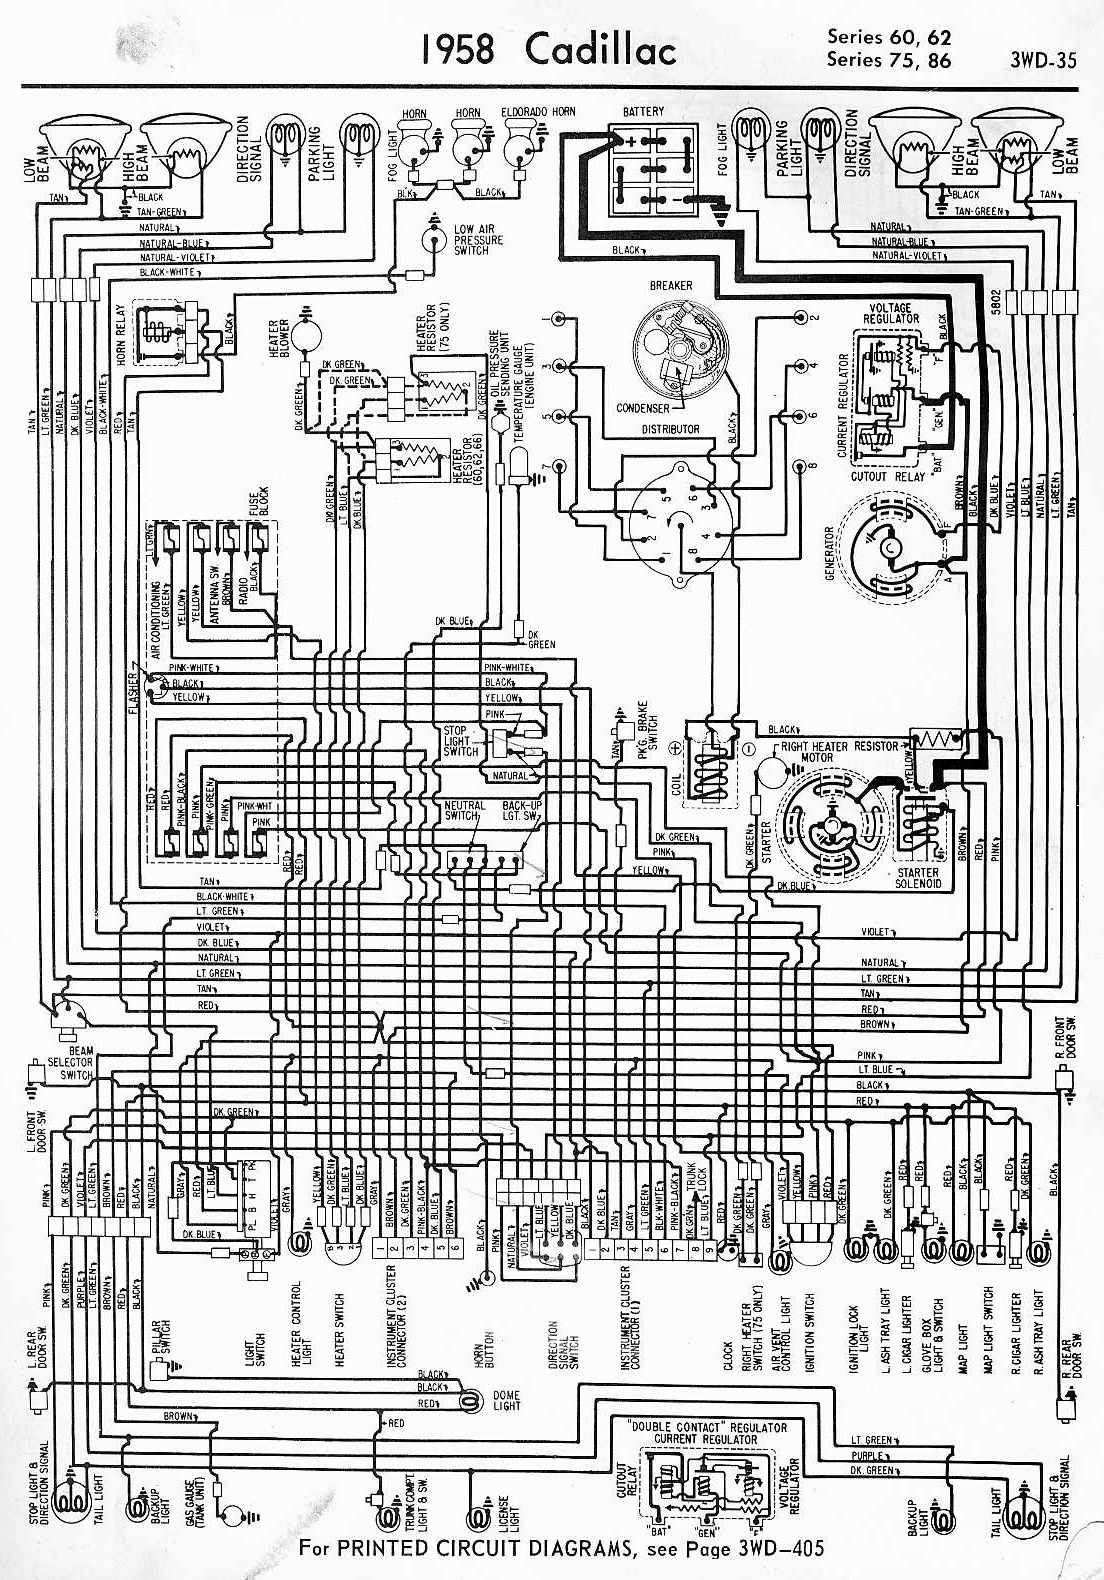 1993 lincoln mark viii radio wiring diagram 1993 ford f150